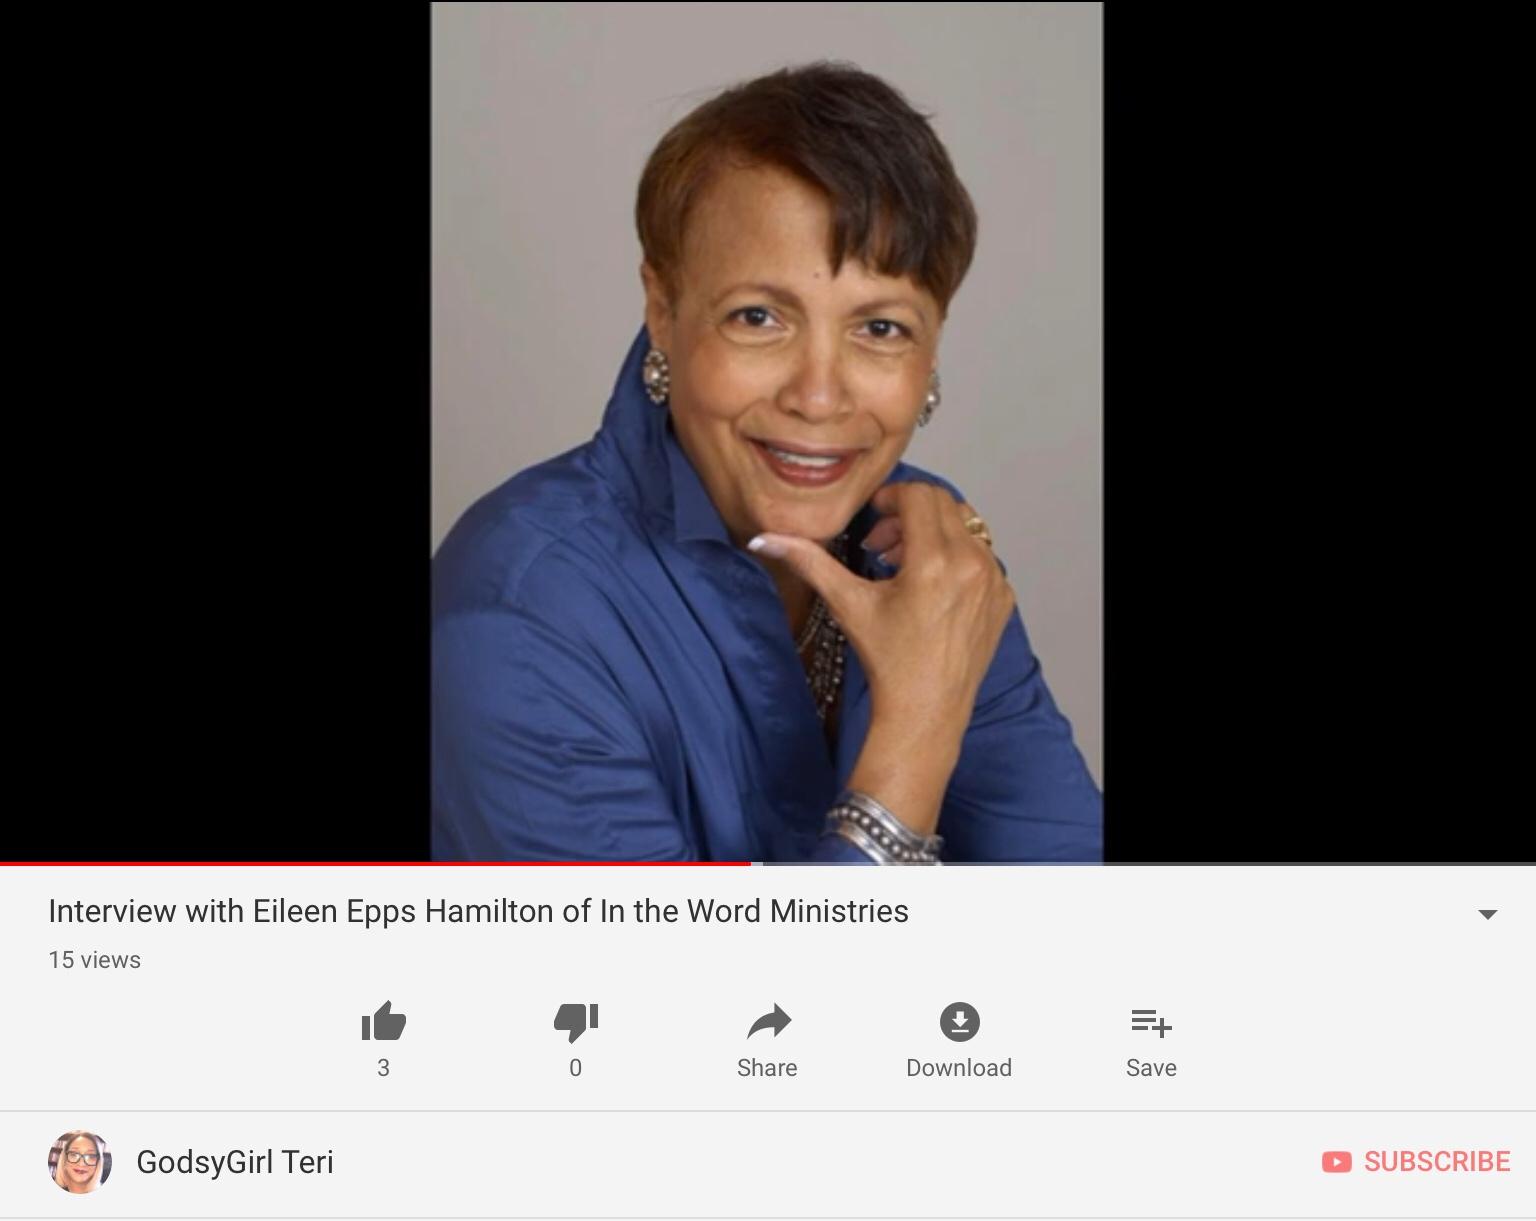 Eileen Epps Hamilton - Wisdom for Women